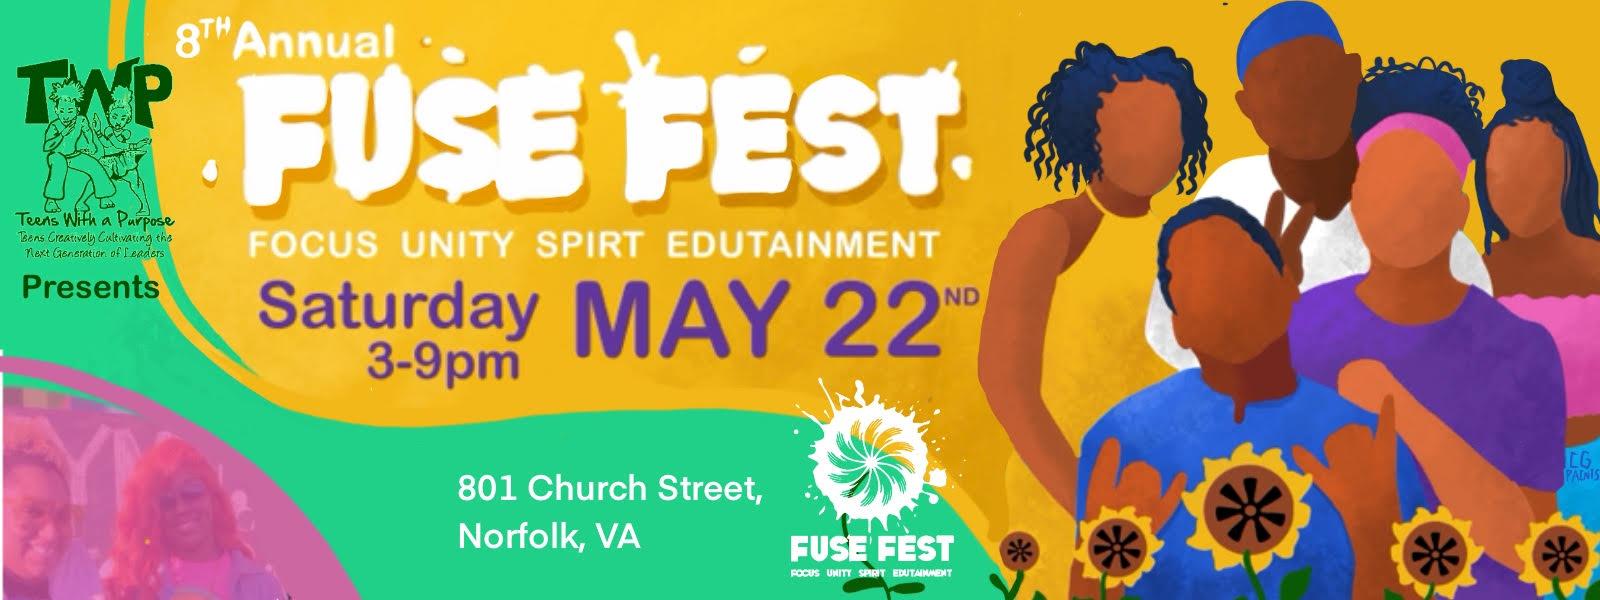 8th Annual FUSE Fest